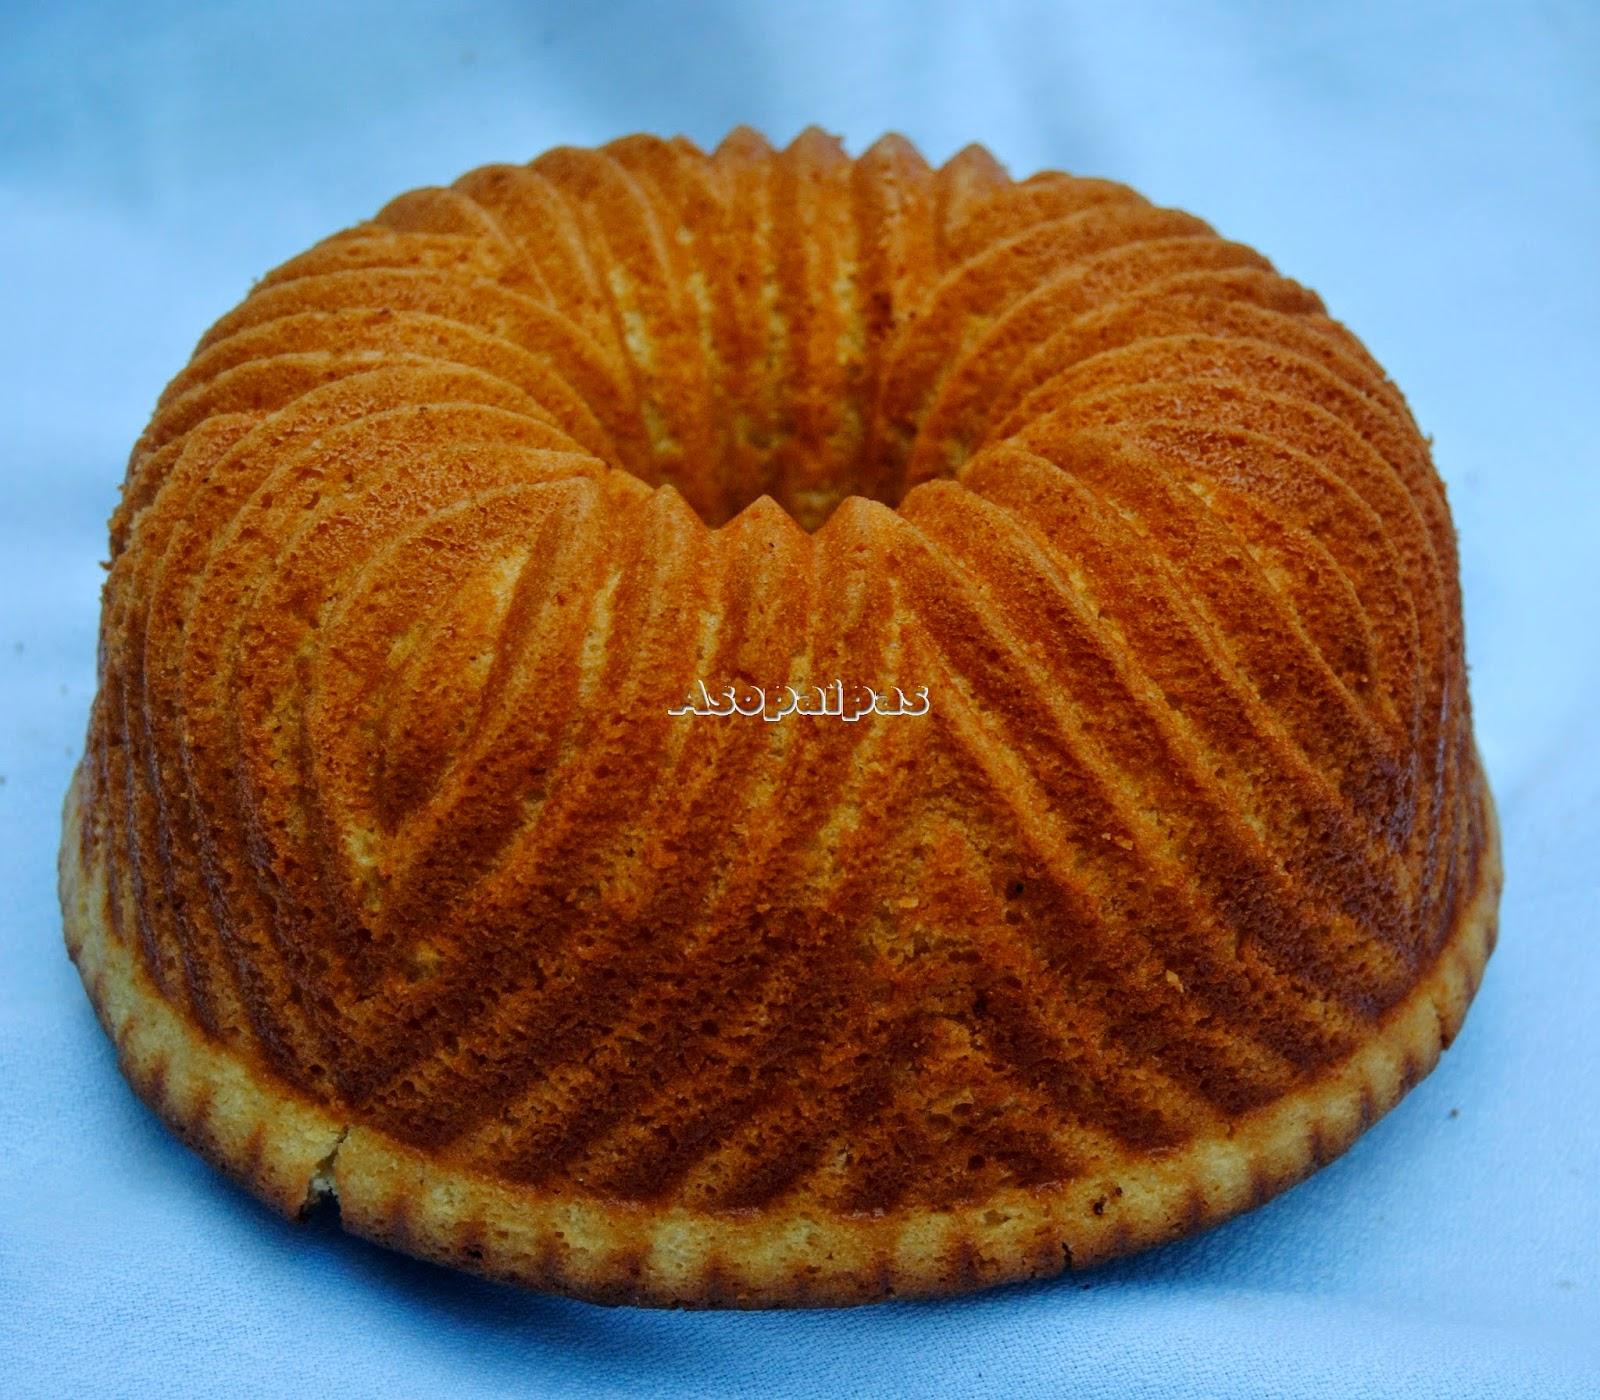 http://www.asopaipas.com/2014/05/bundt-cake-de-naranja.html